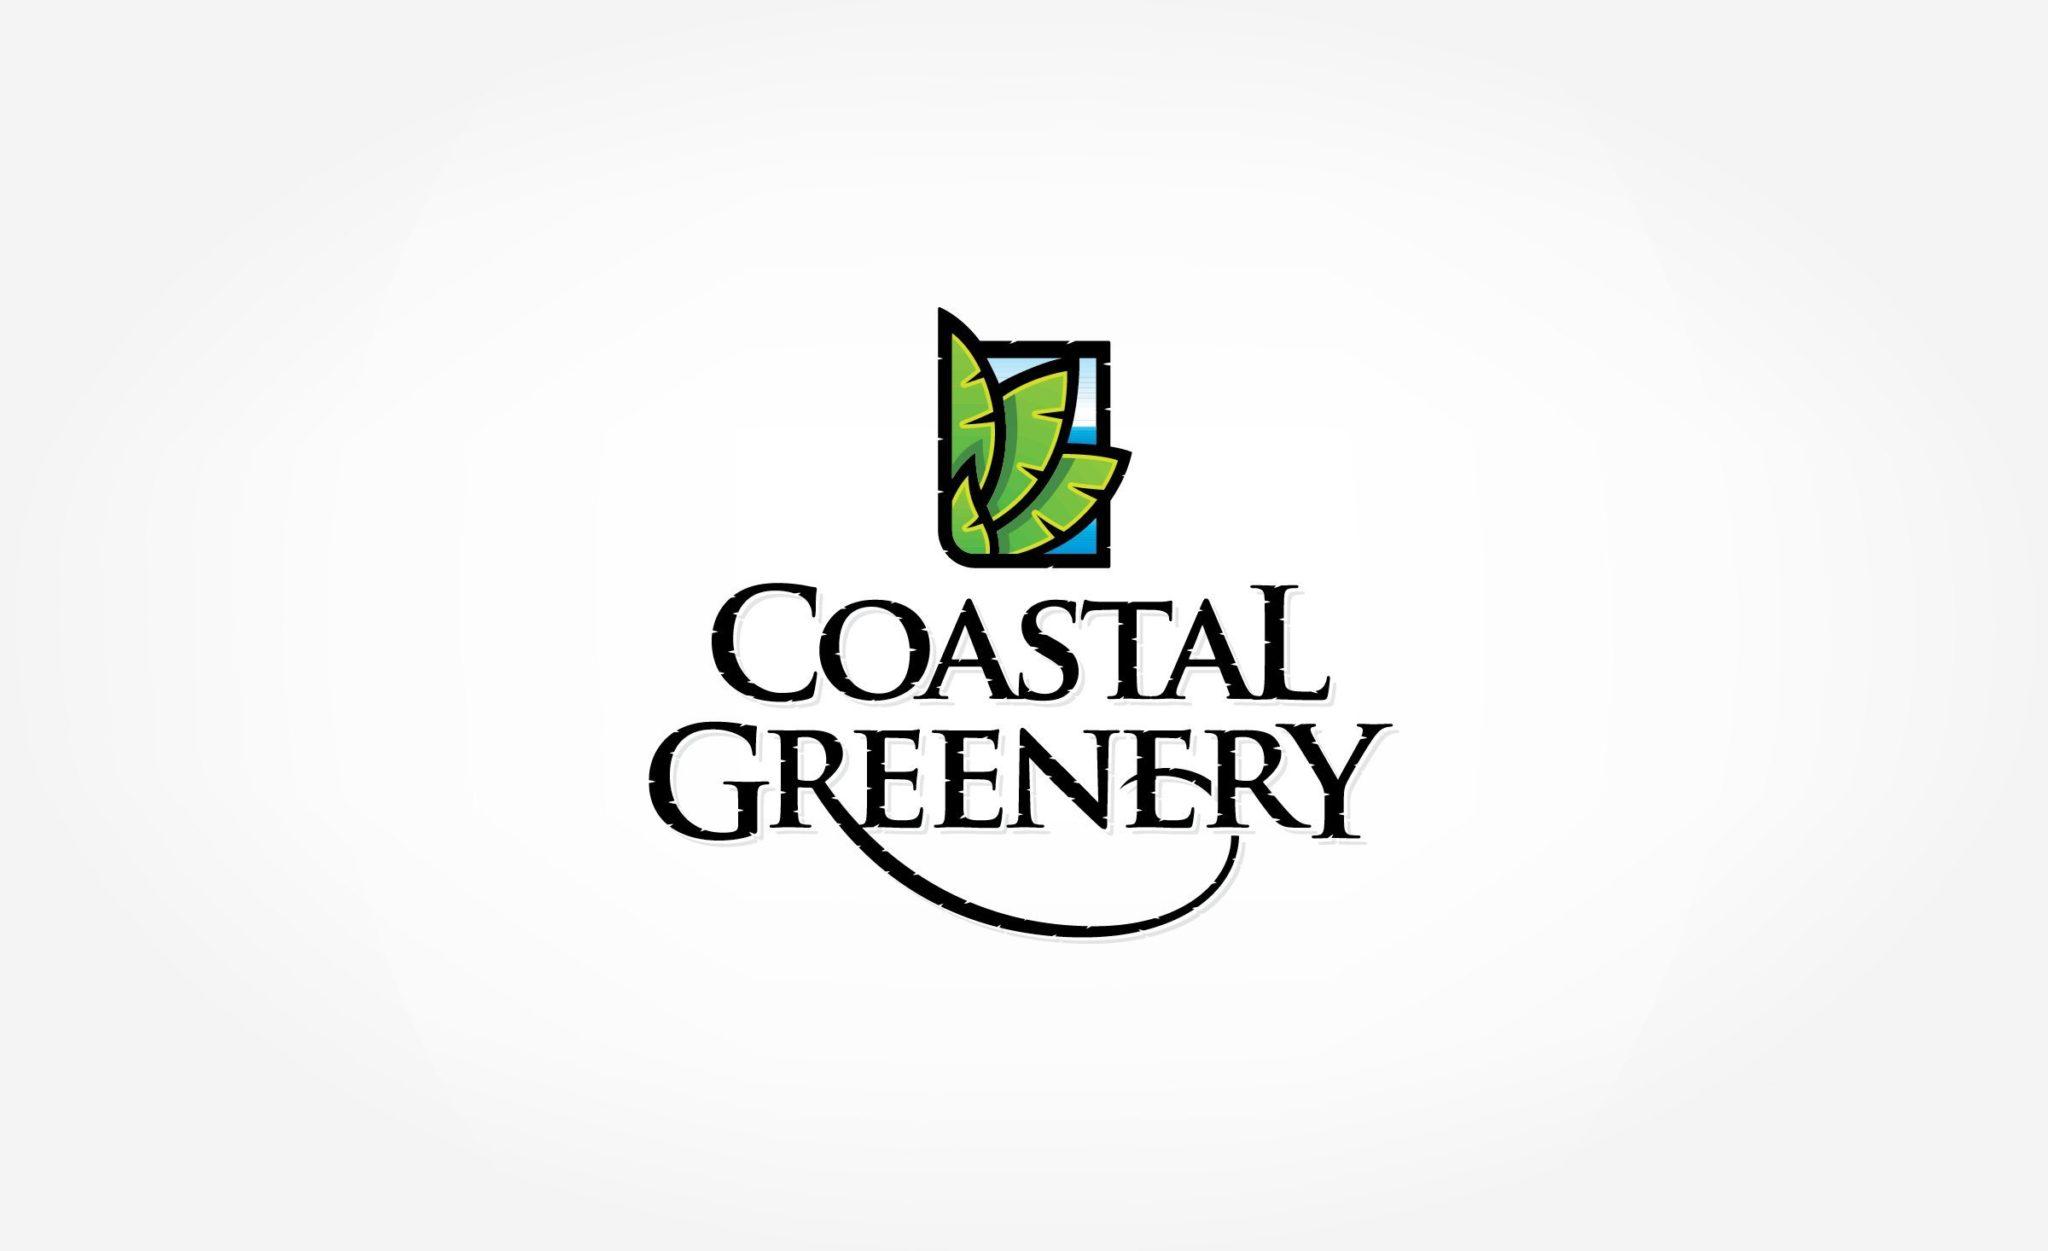 coastal greenery